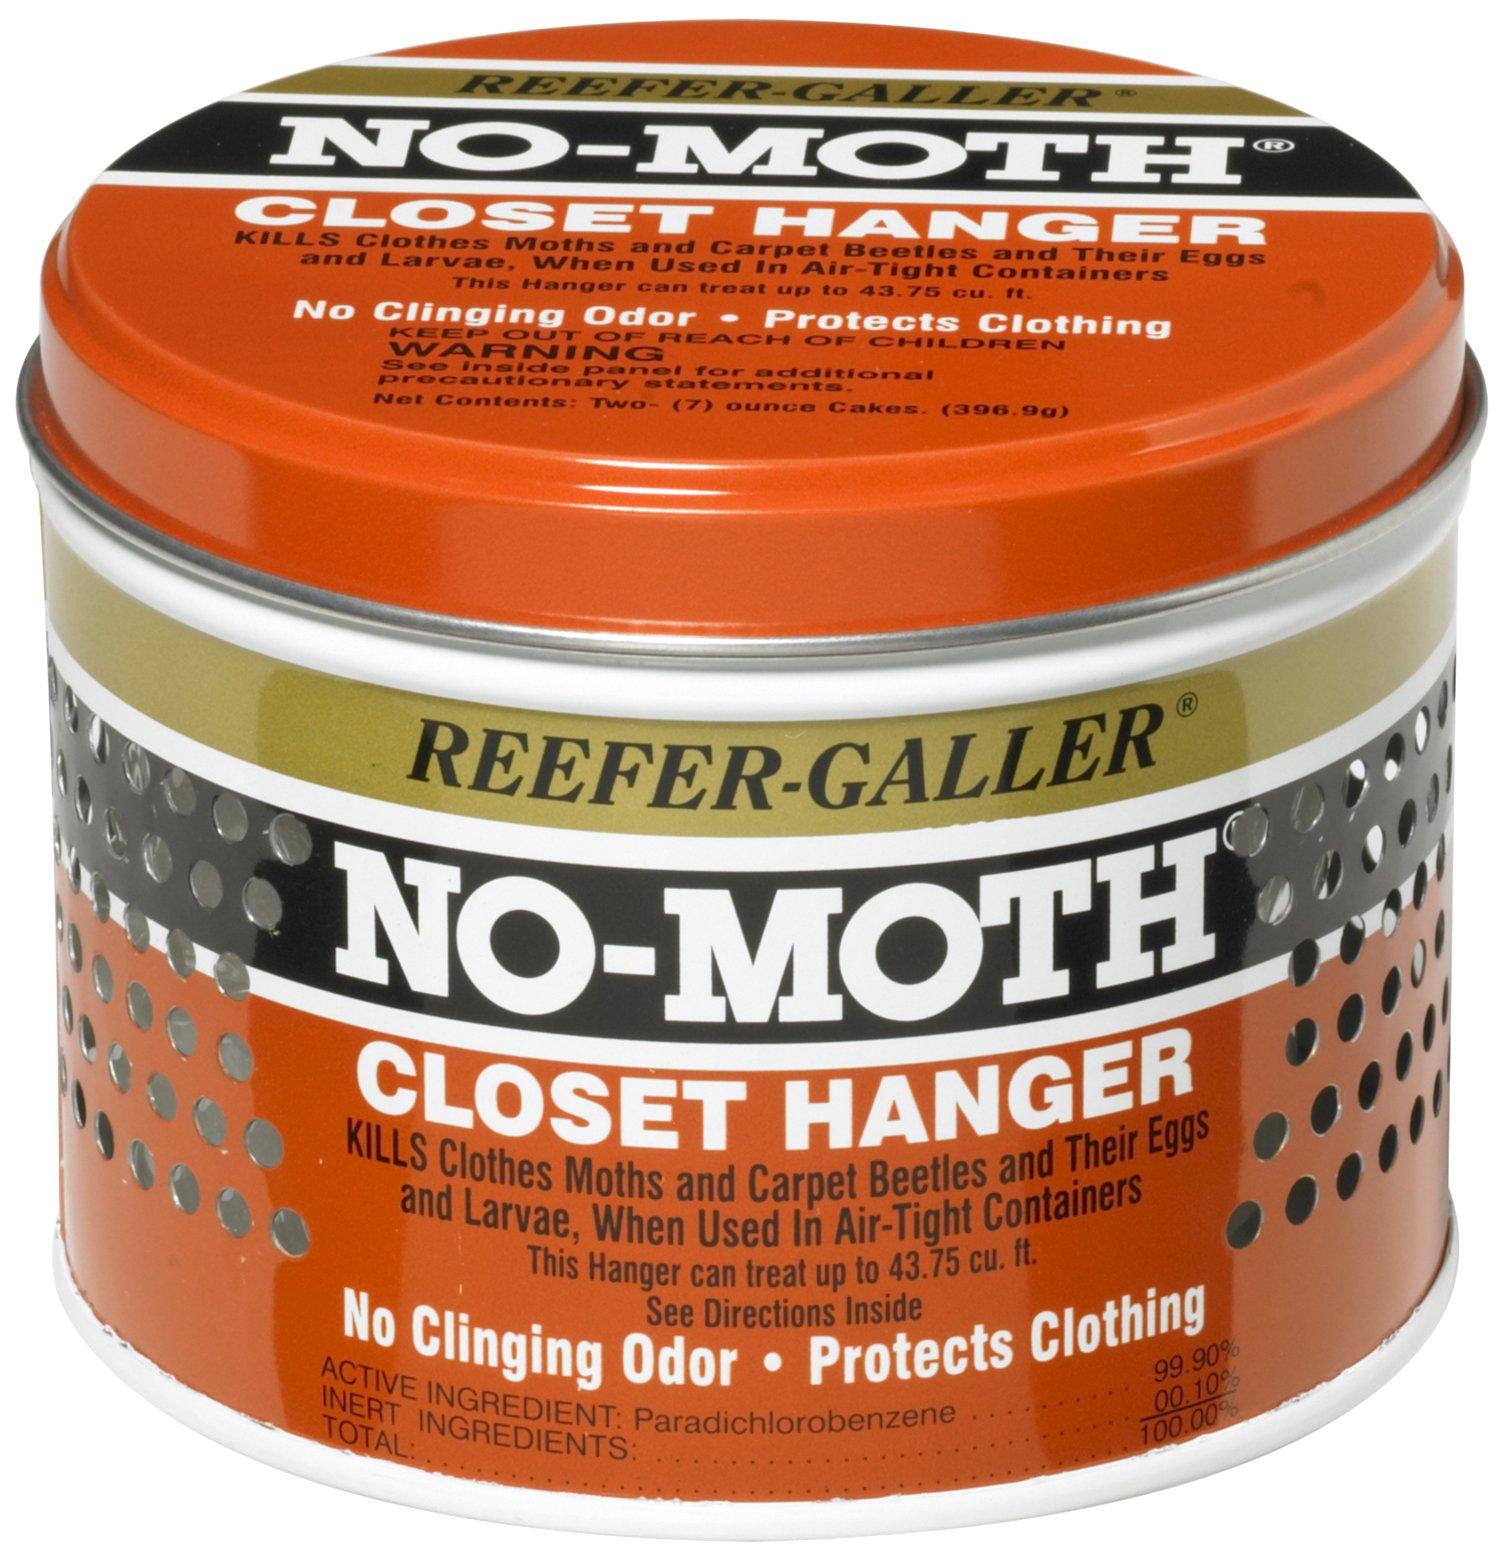 Reefer-Galler NO Moth Closet Hanger (3)